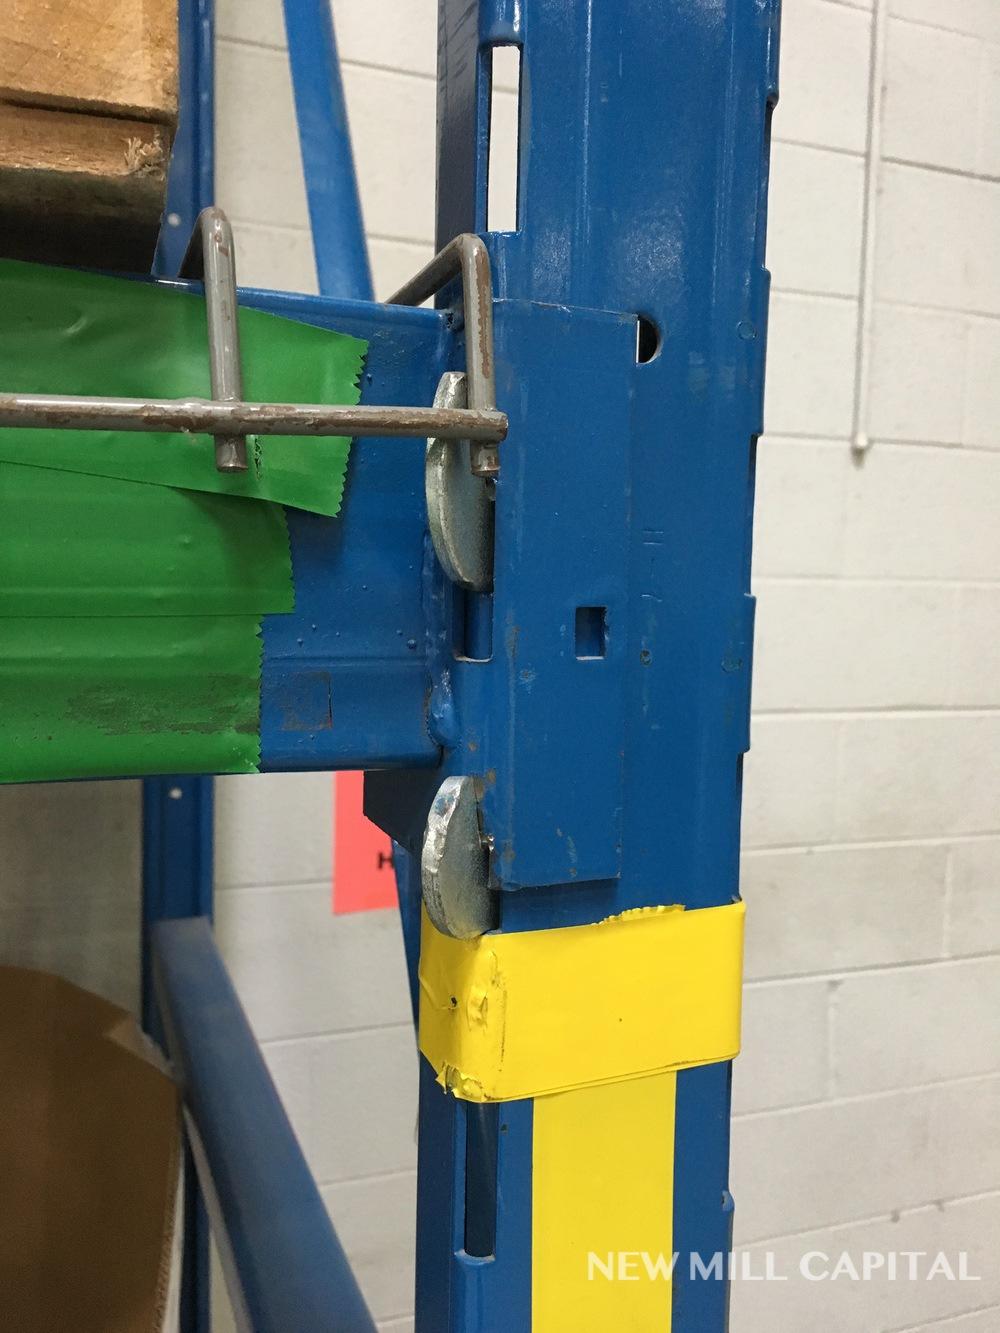 Lot 10 - Ridg-U-Rak Slotted Pallet Rack, (18) Uprights (3in x 1-5/8 in Columns,   Rig: See Lot Description